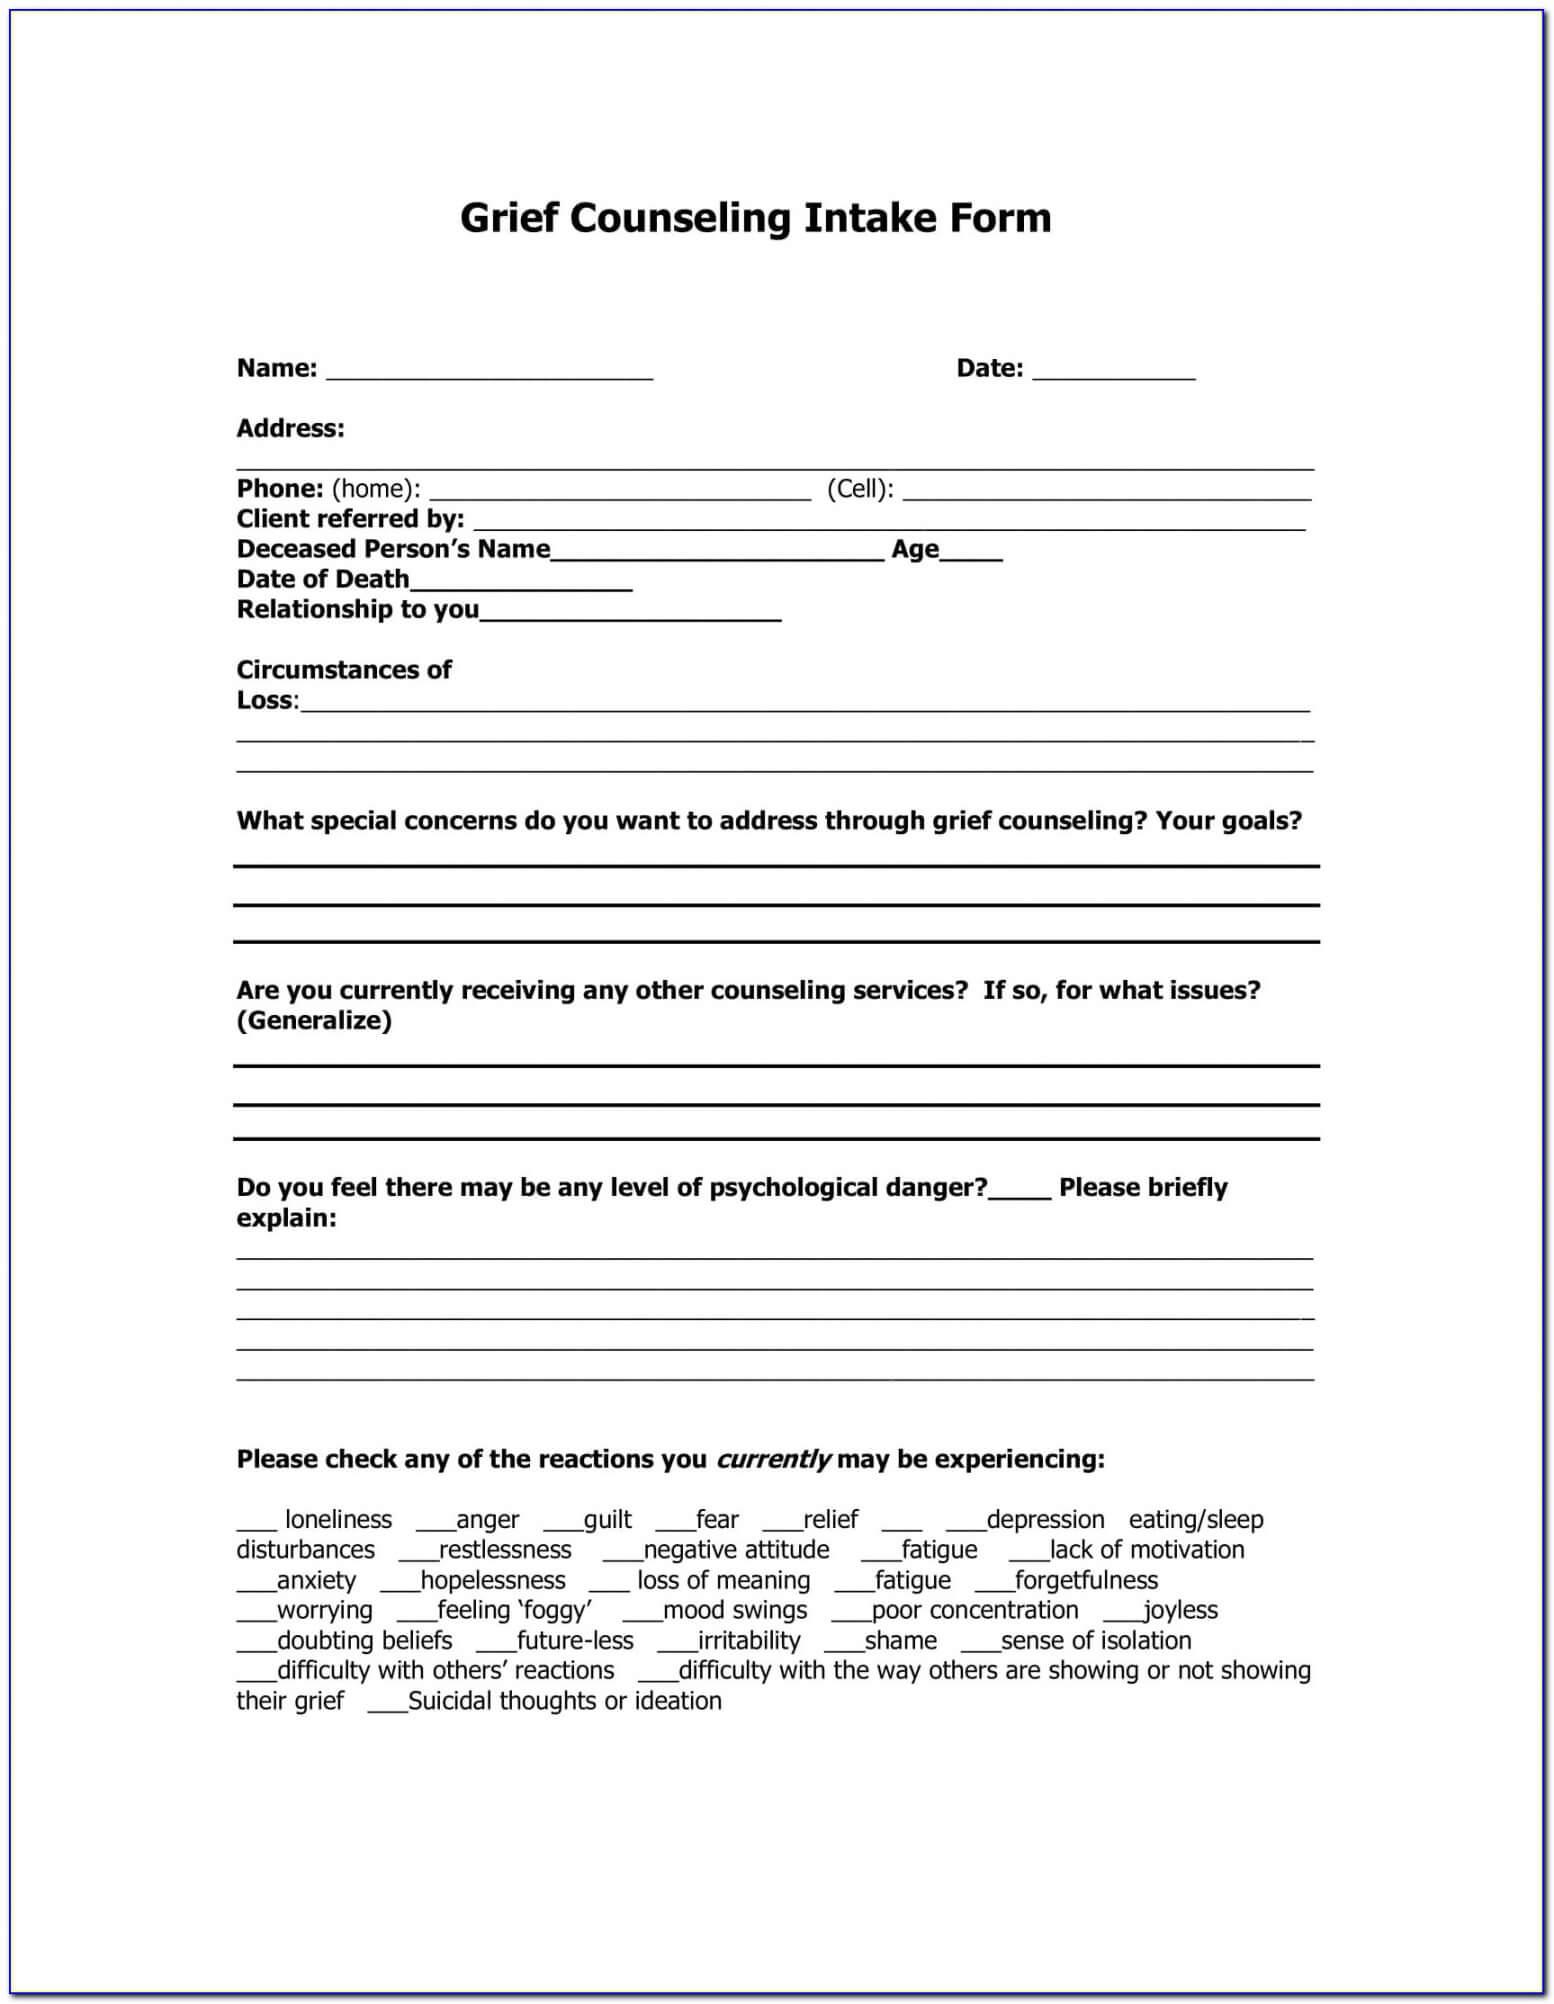 Printable Premarital Counseling Certificate Of Completion Intended For Premarital Counseling Certificate Of Completion Template